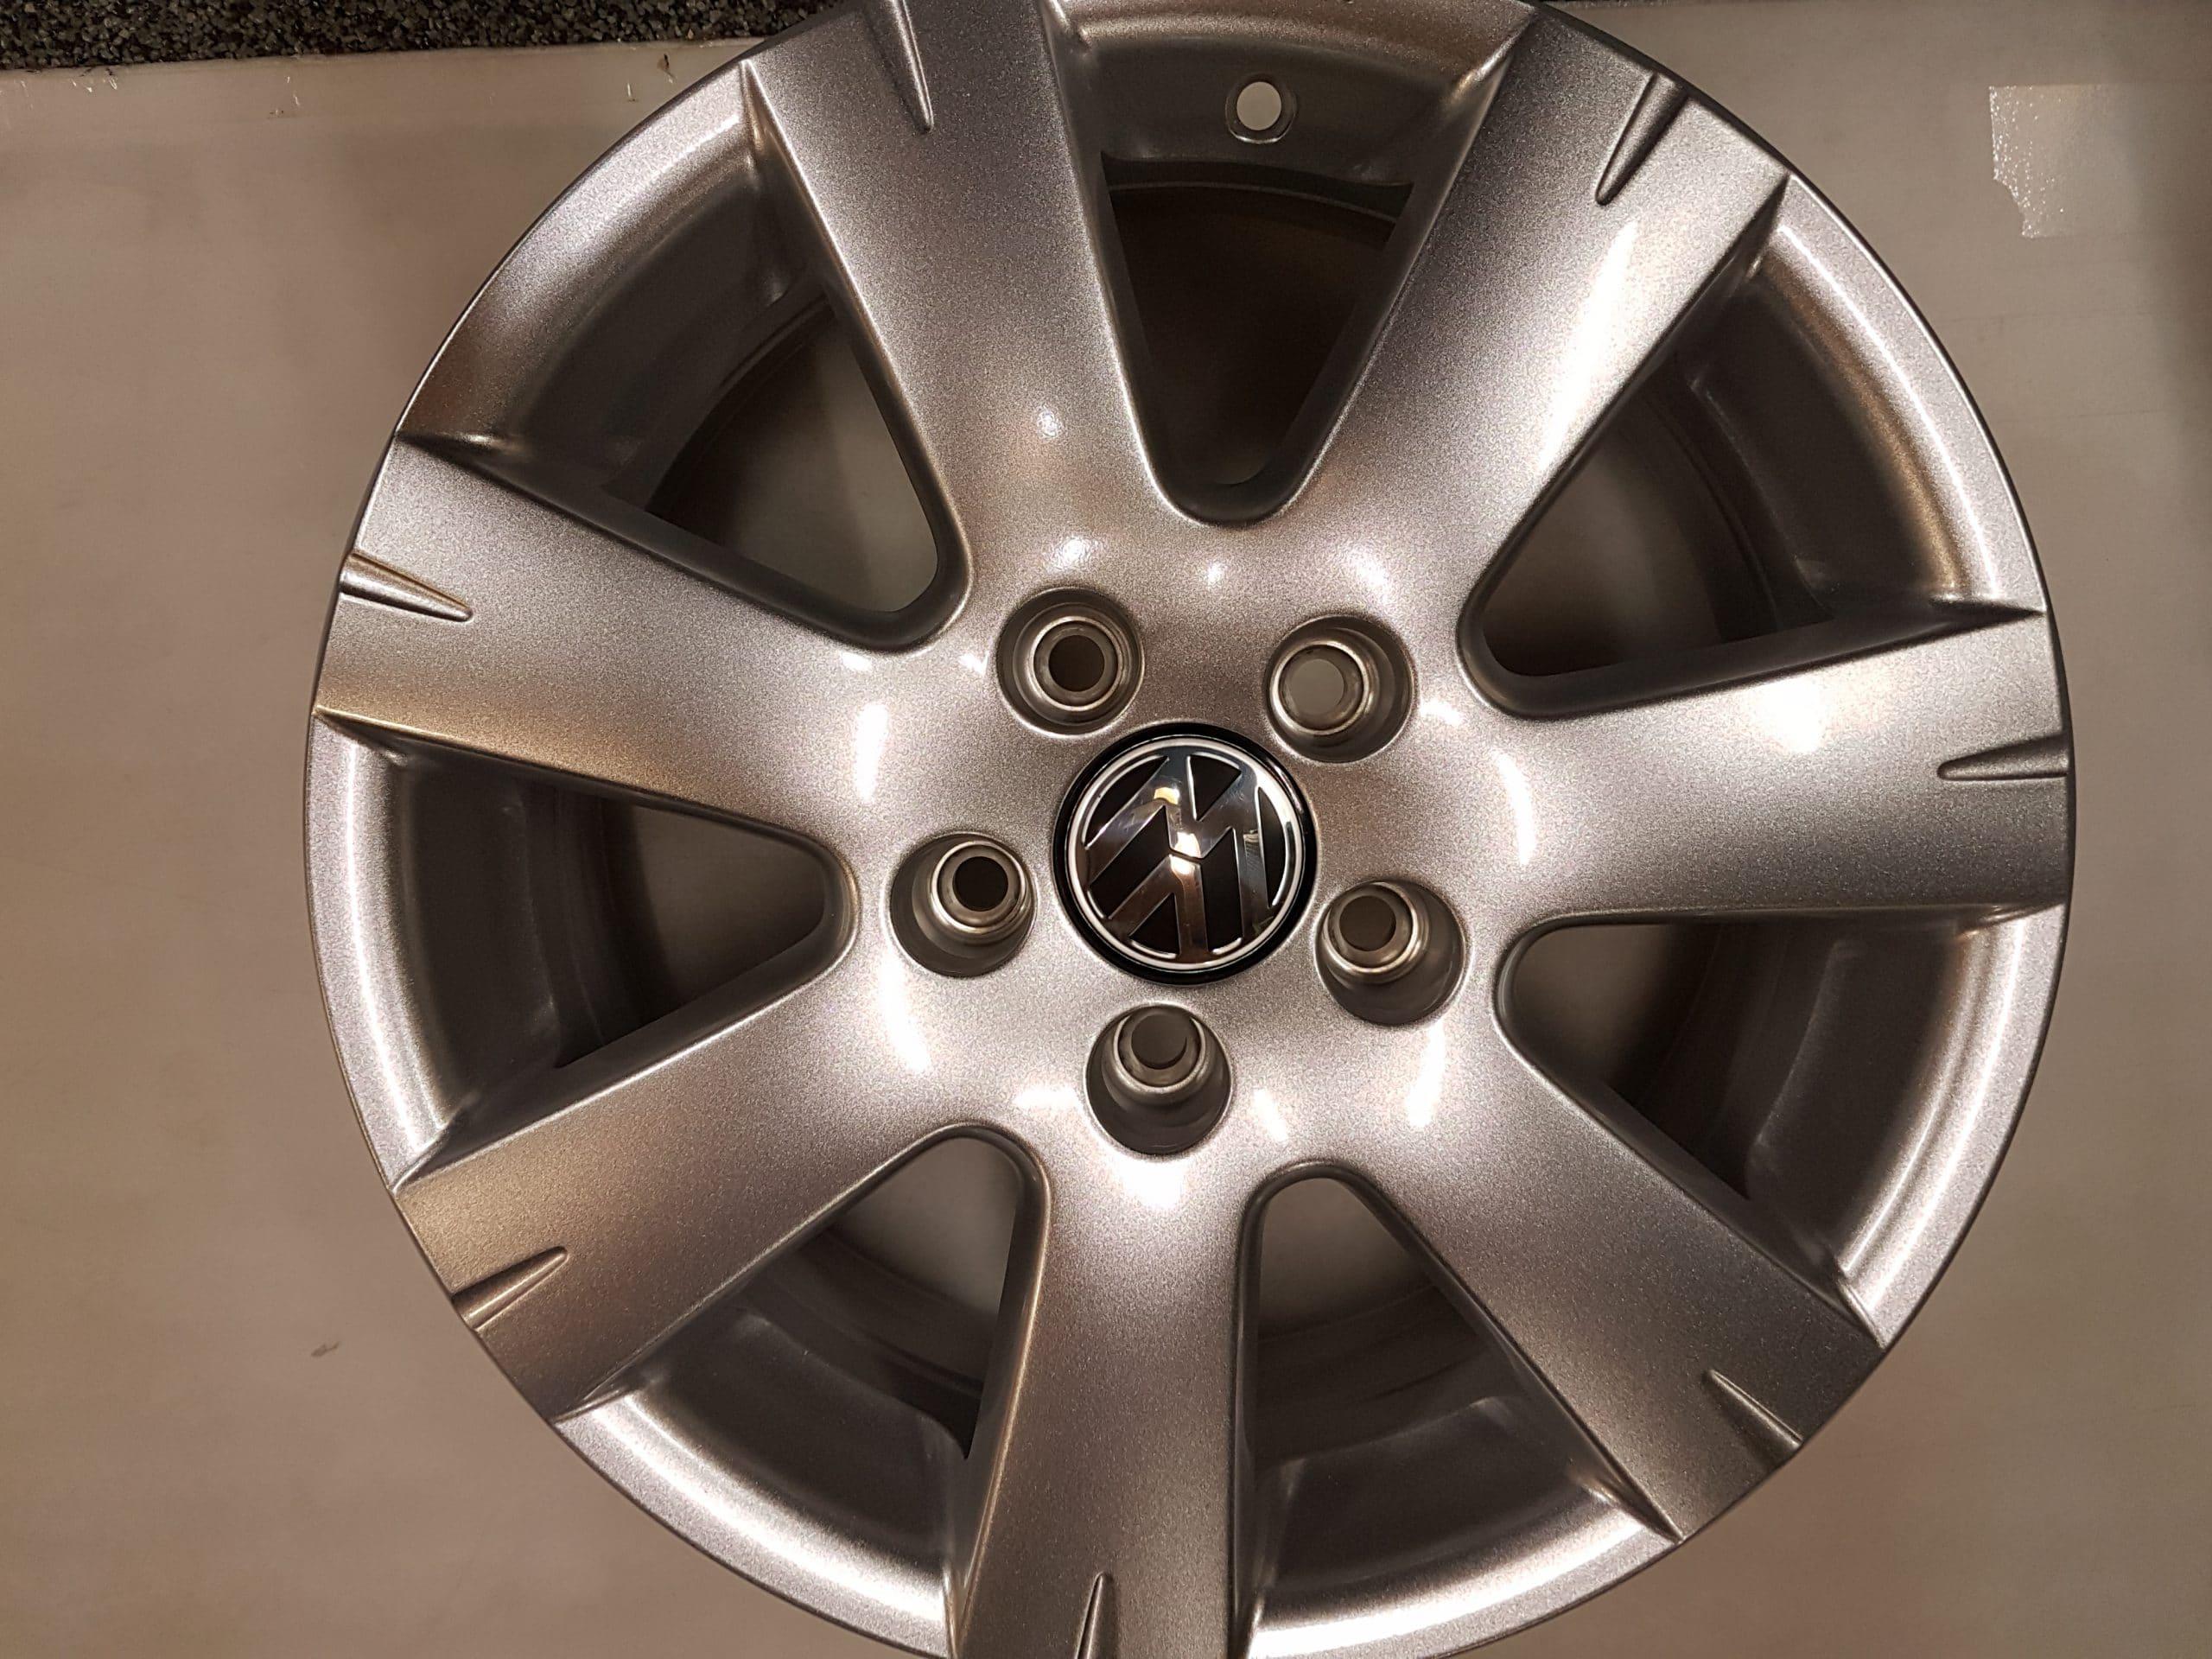 Velgen Origineel Volkswagen Golf 7 16 Inch Vredestein 205 55 16 Winterbanden